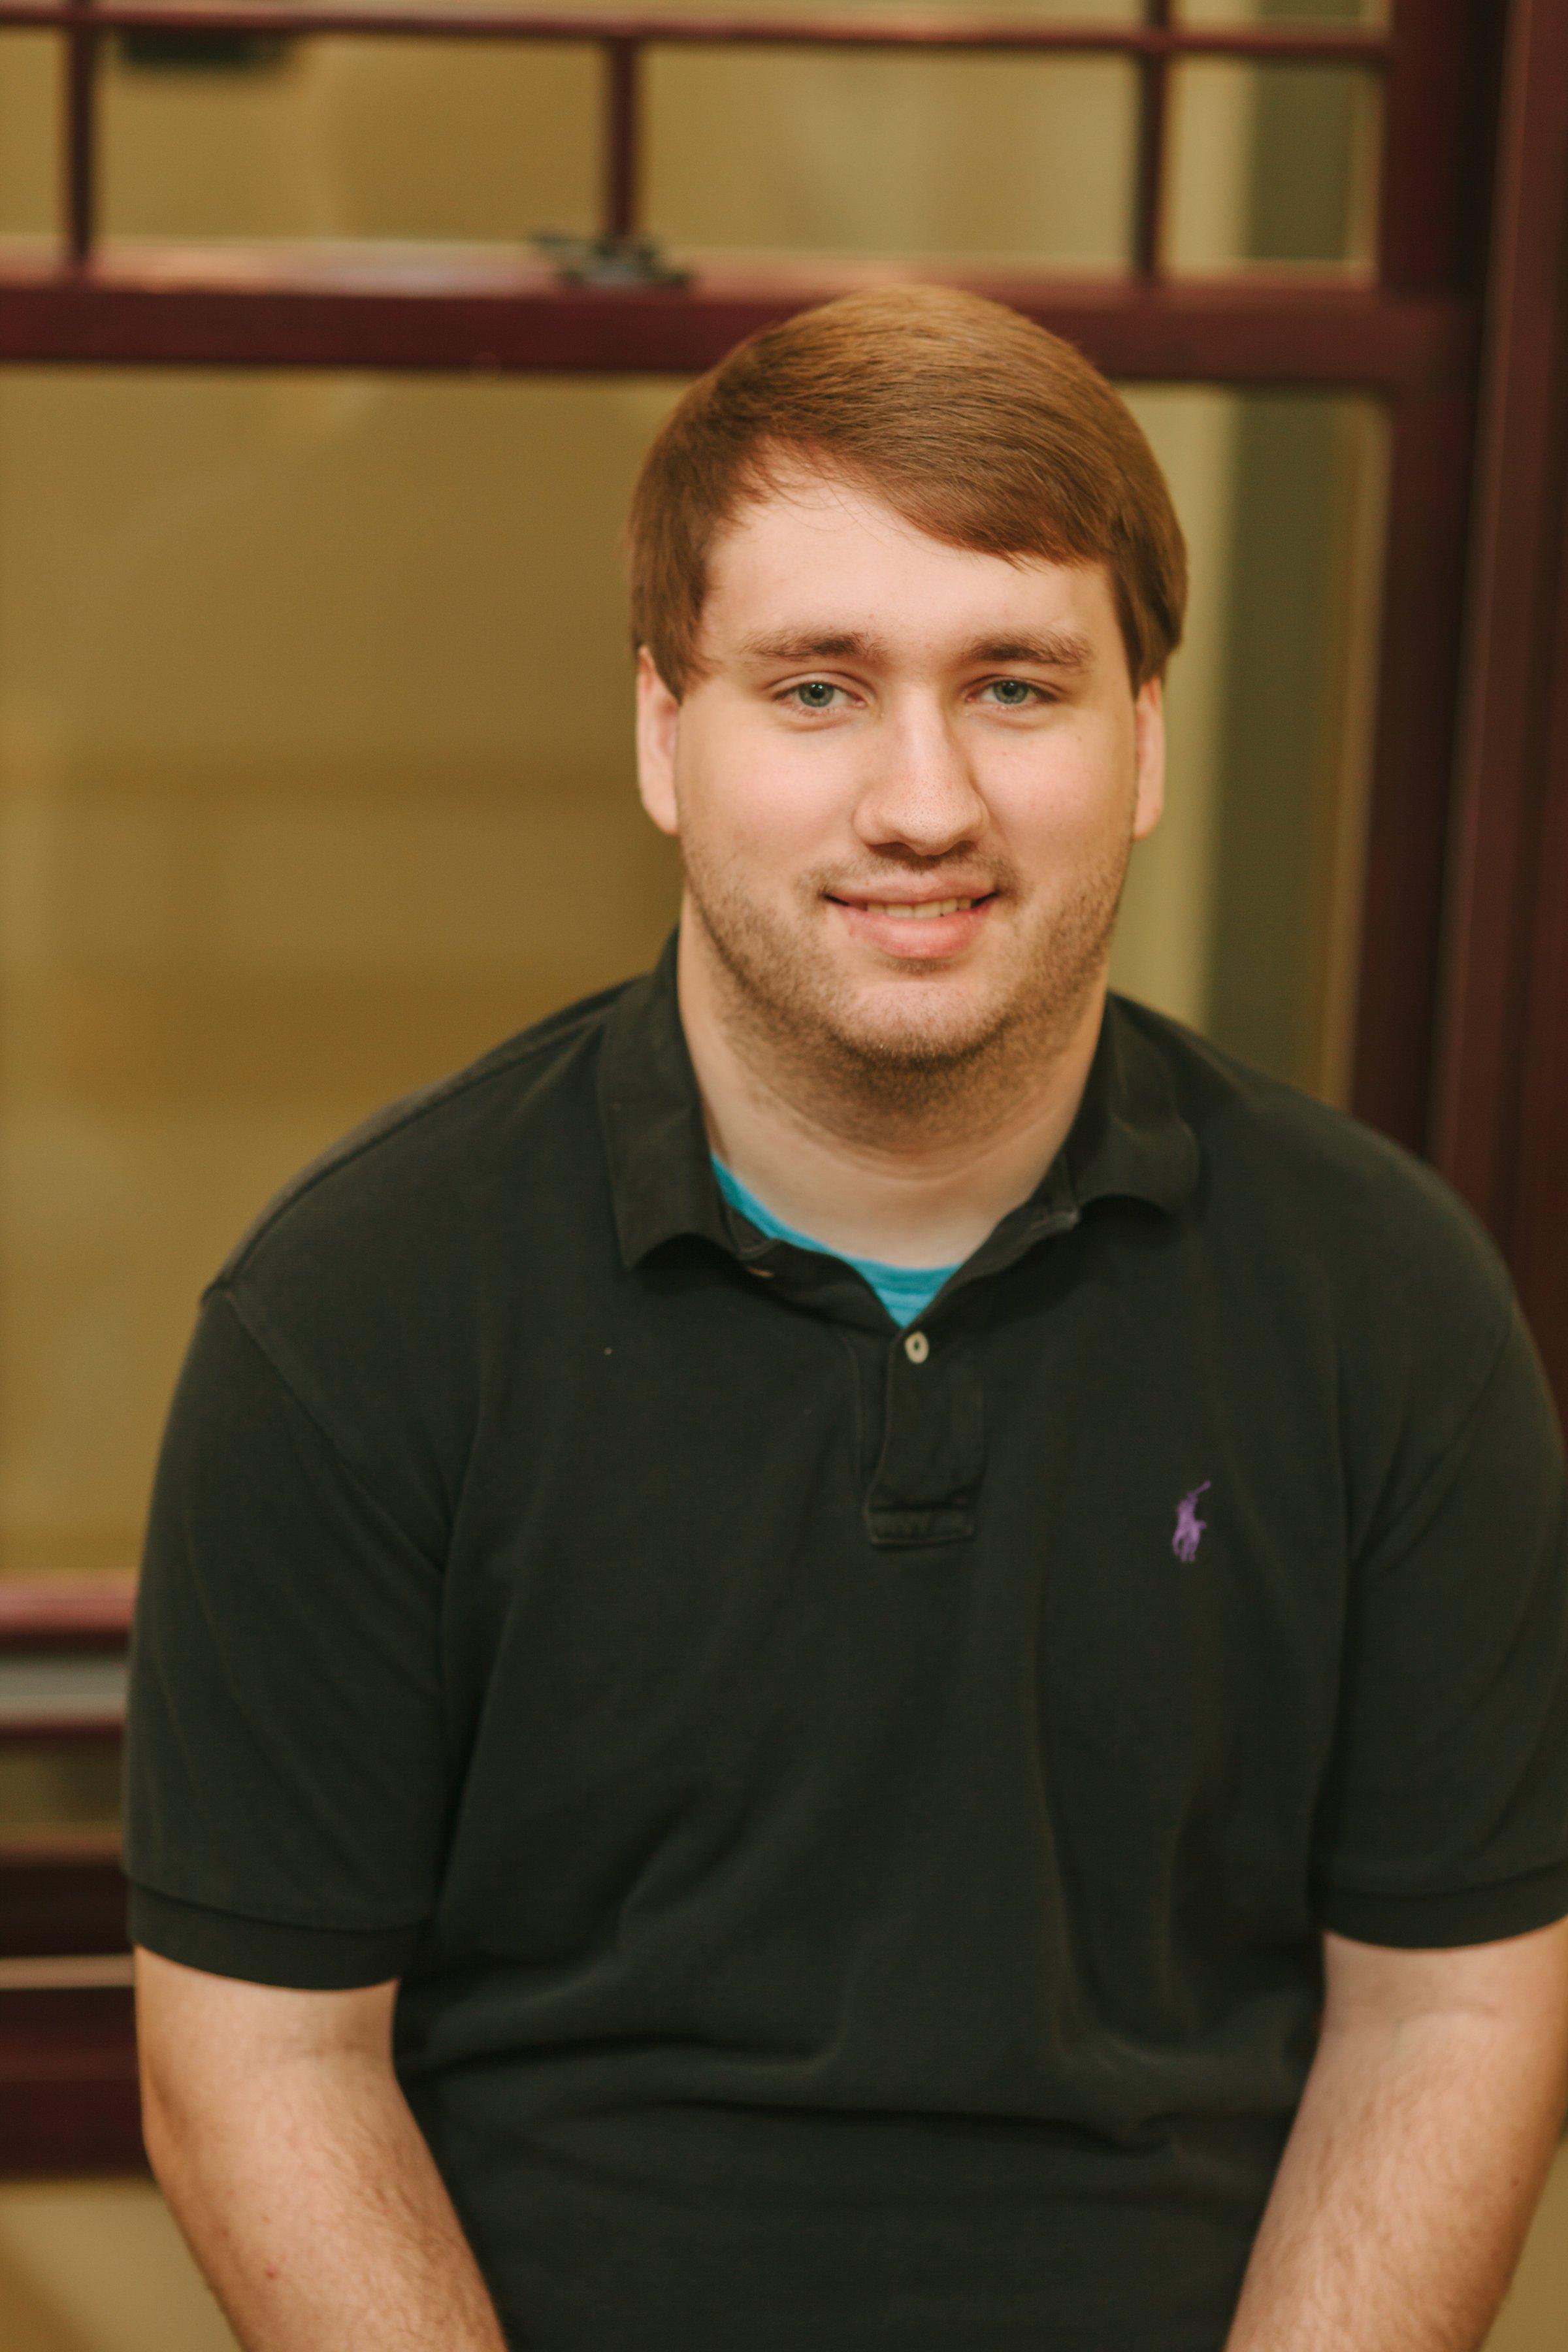 James Frantz | Operations Assistant & IT Specialist